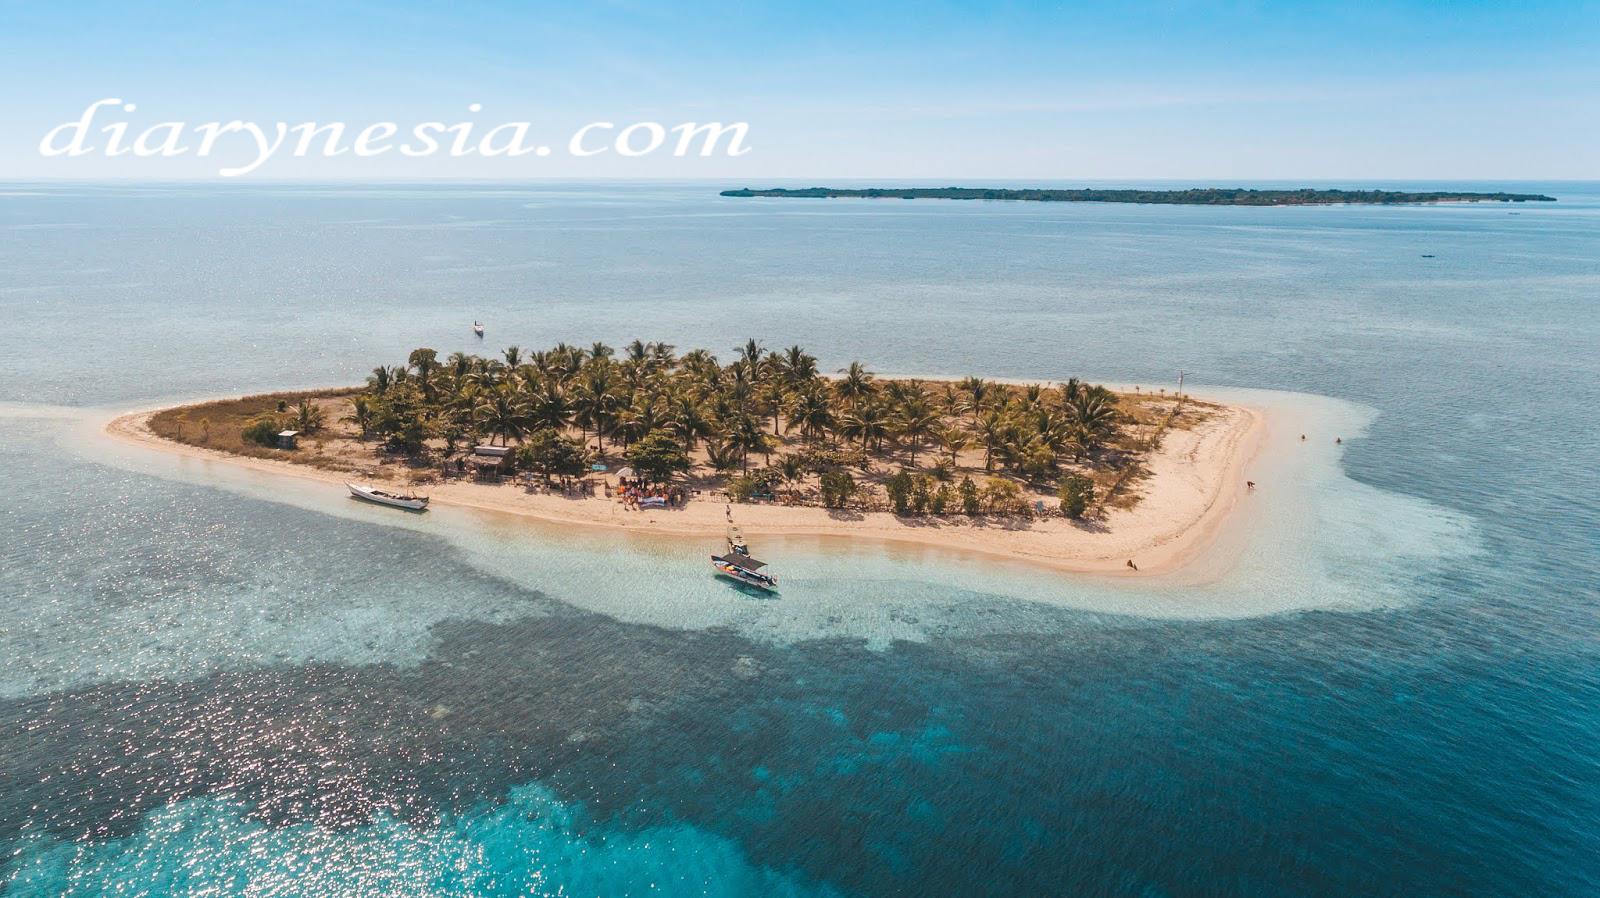 Sumbawa Tourism, Sumbawa Island, Indonesia Tourism, diarynesia